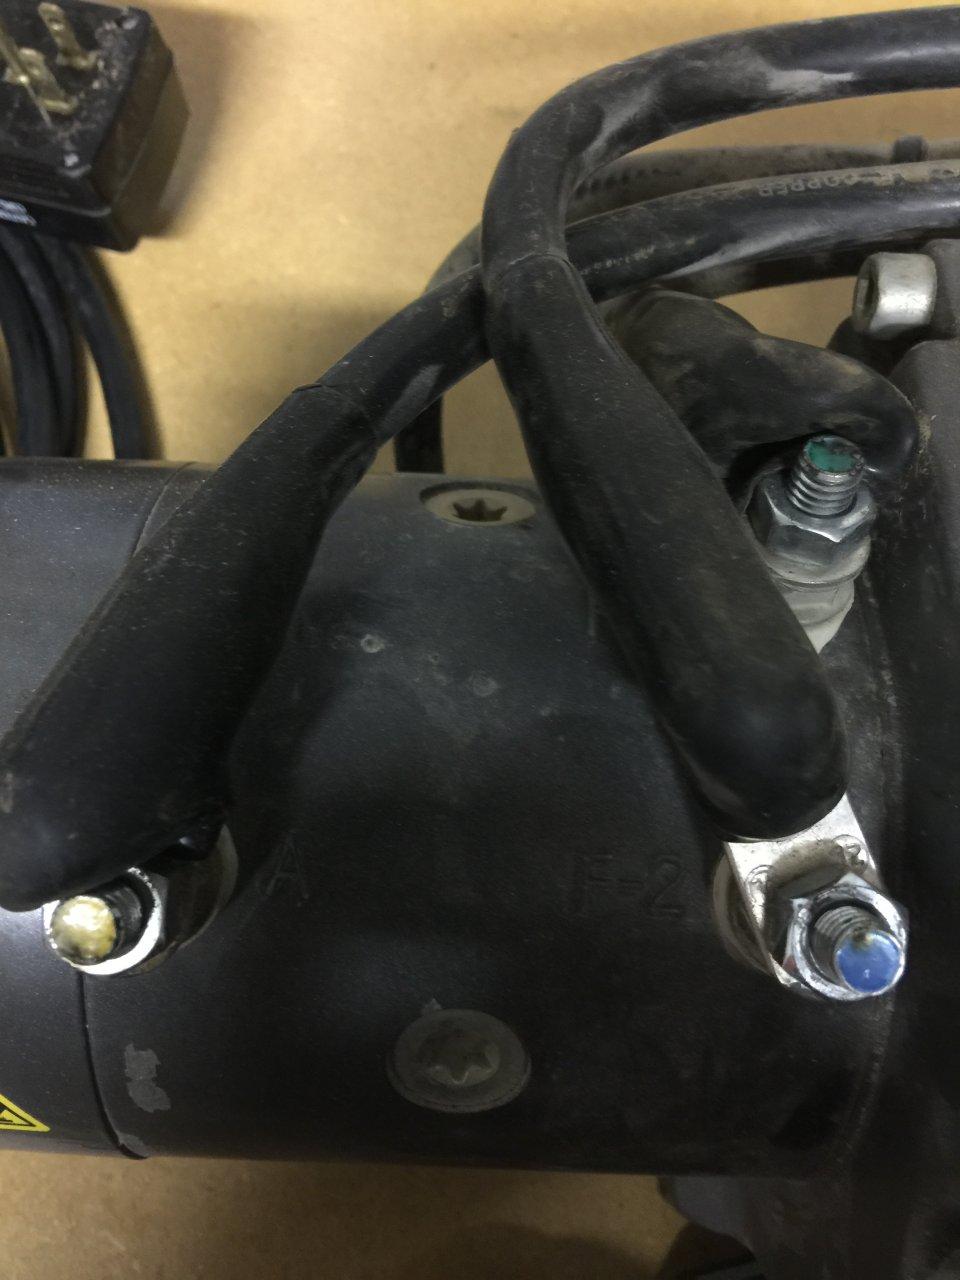 warn m8000 winch wiring diagram airbag troubleshooting | ih8mud forum